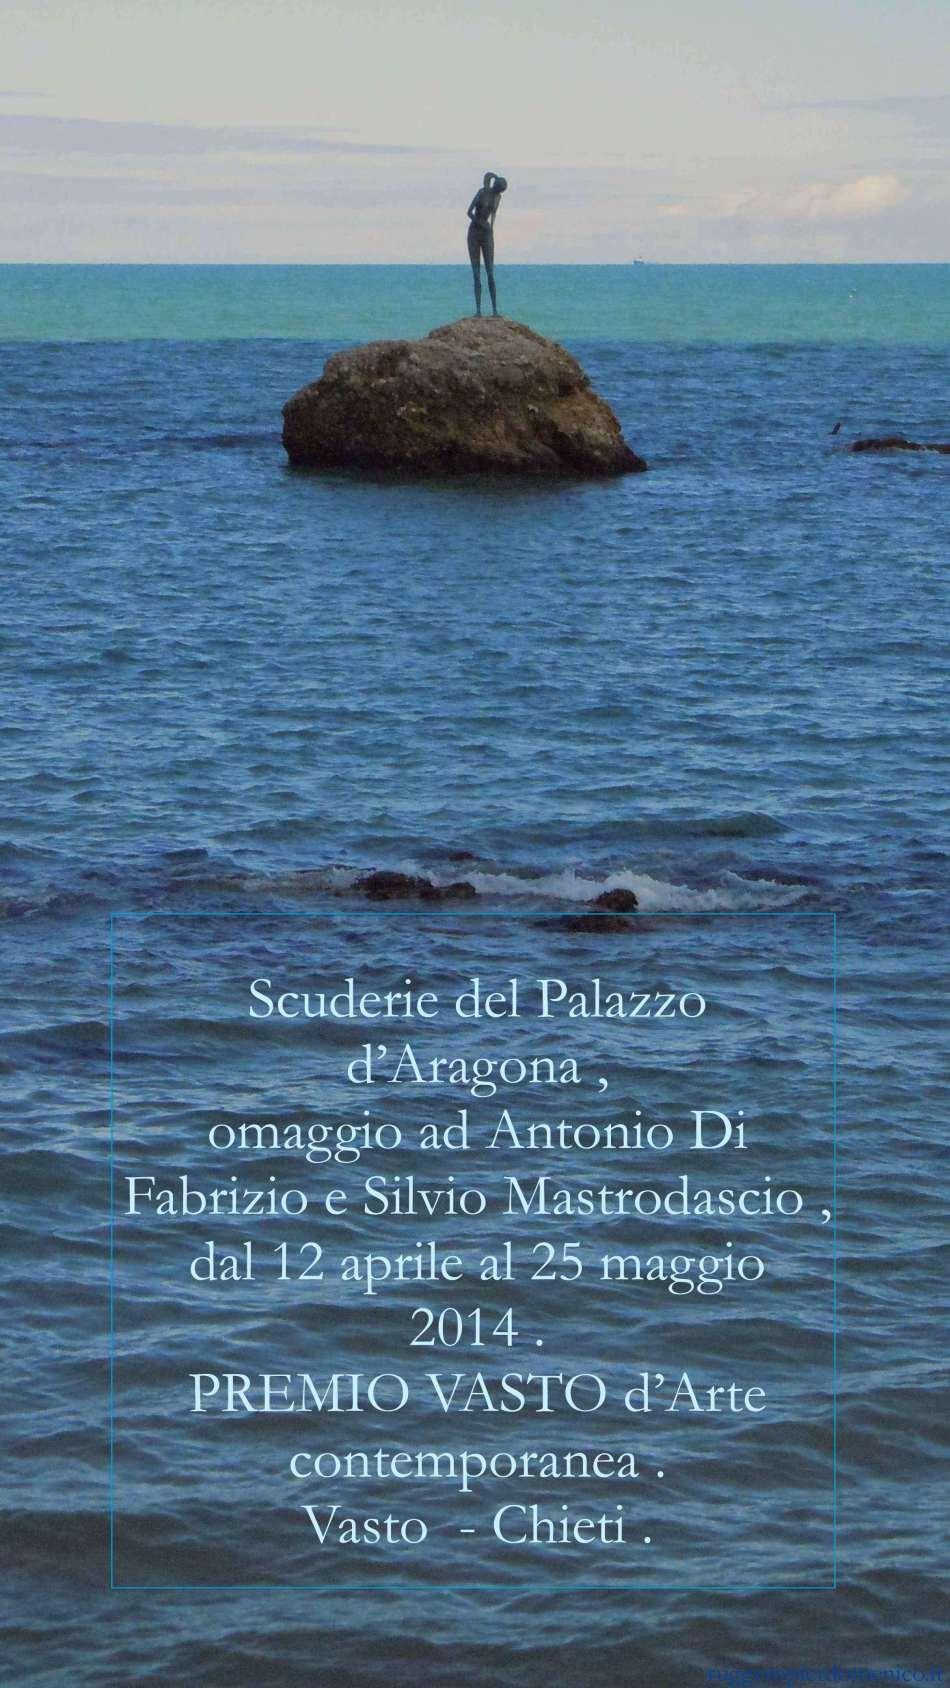 Vasto 2014,locandina (ruggeropierdomenico.it)